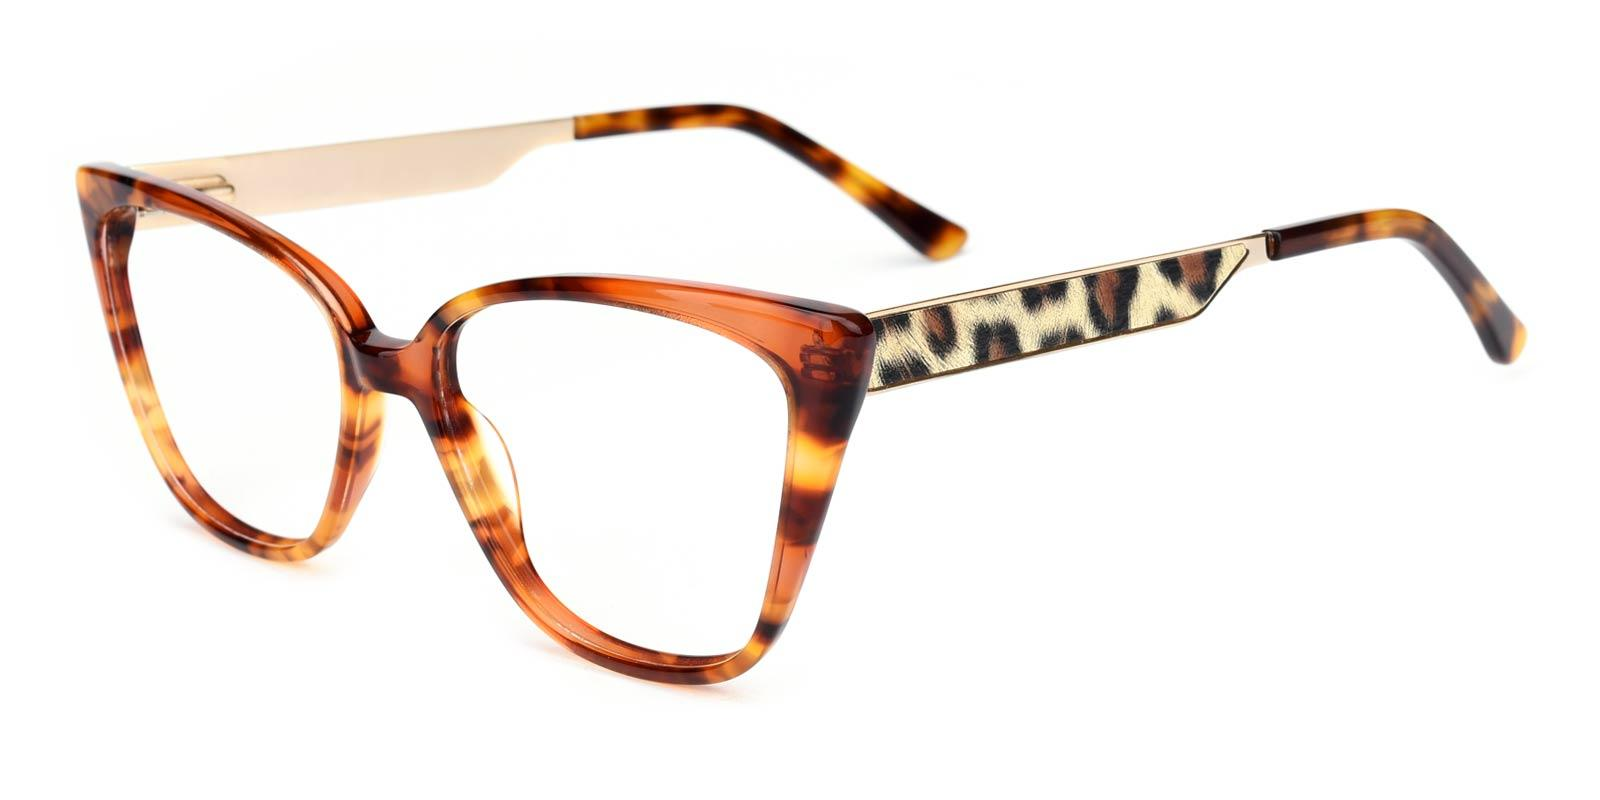 Venus-Tortoise-Cat-Acetate-Eyeglasses-detail